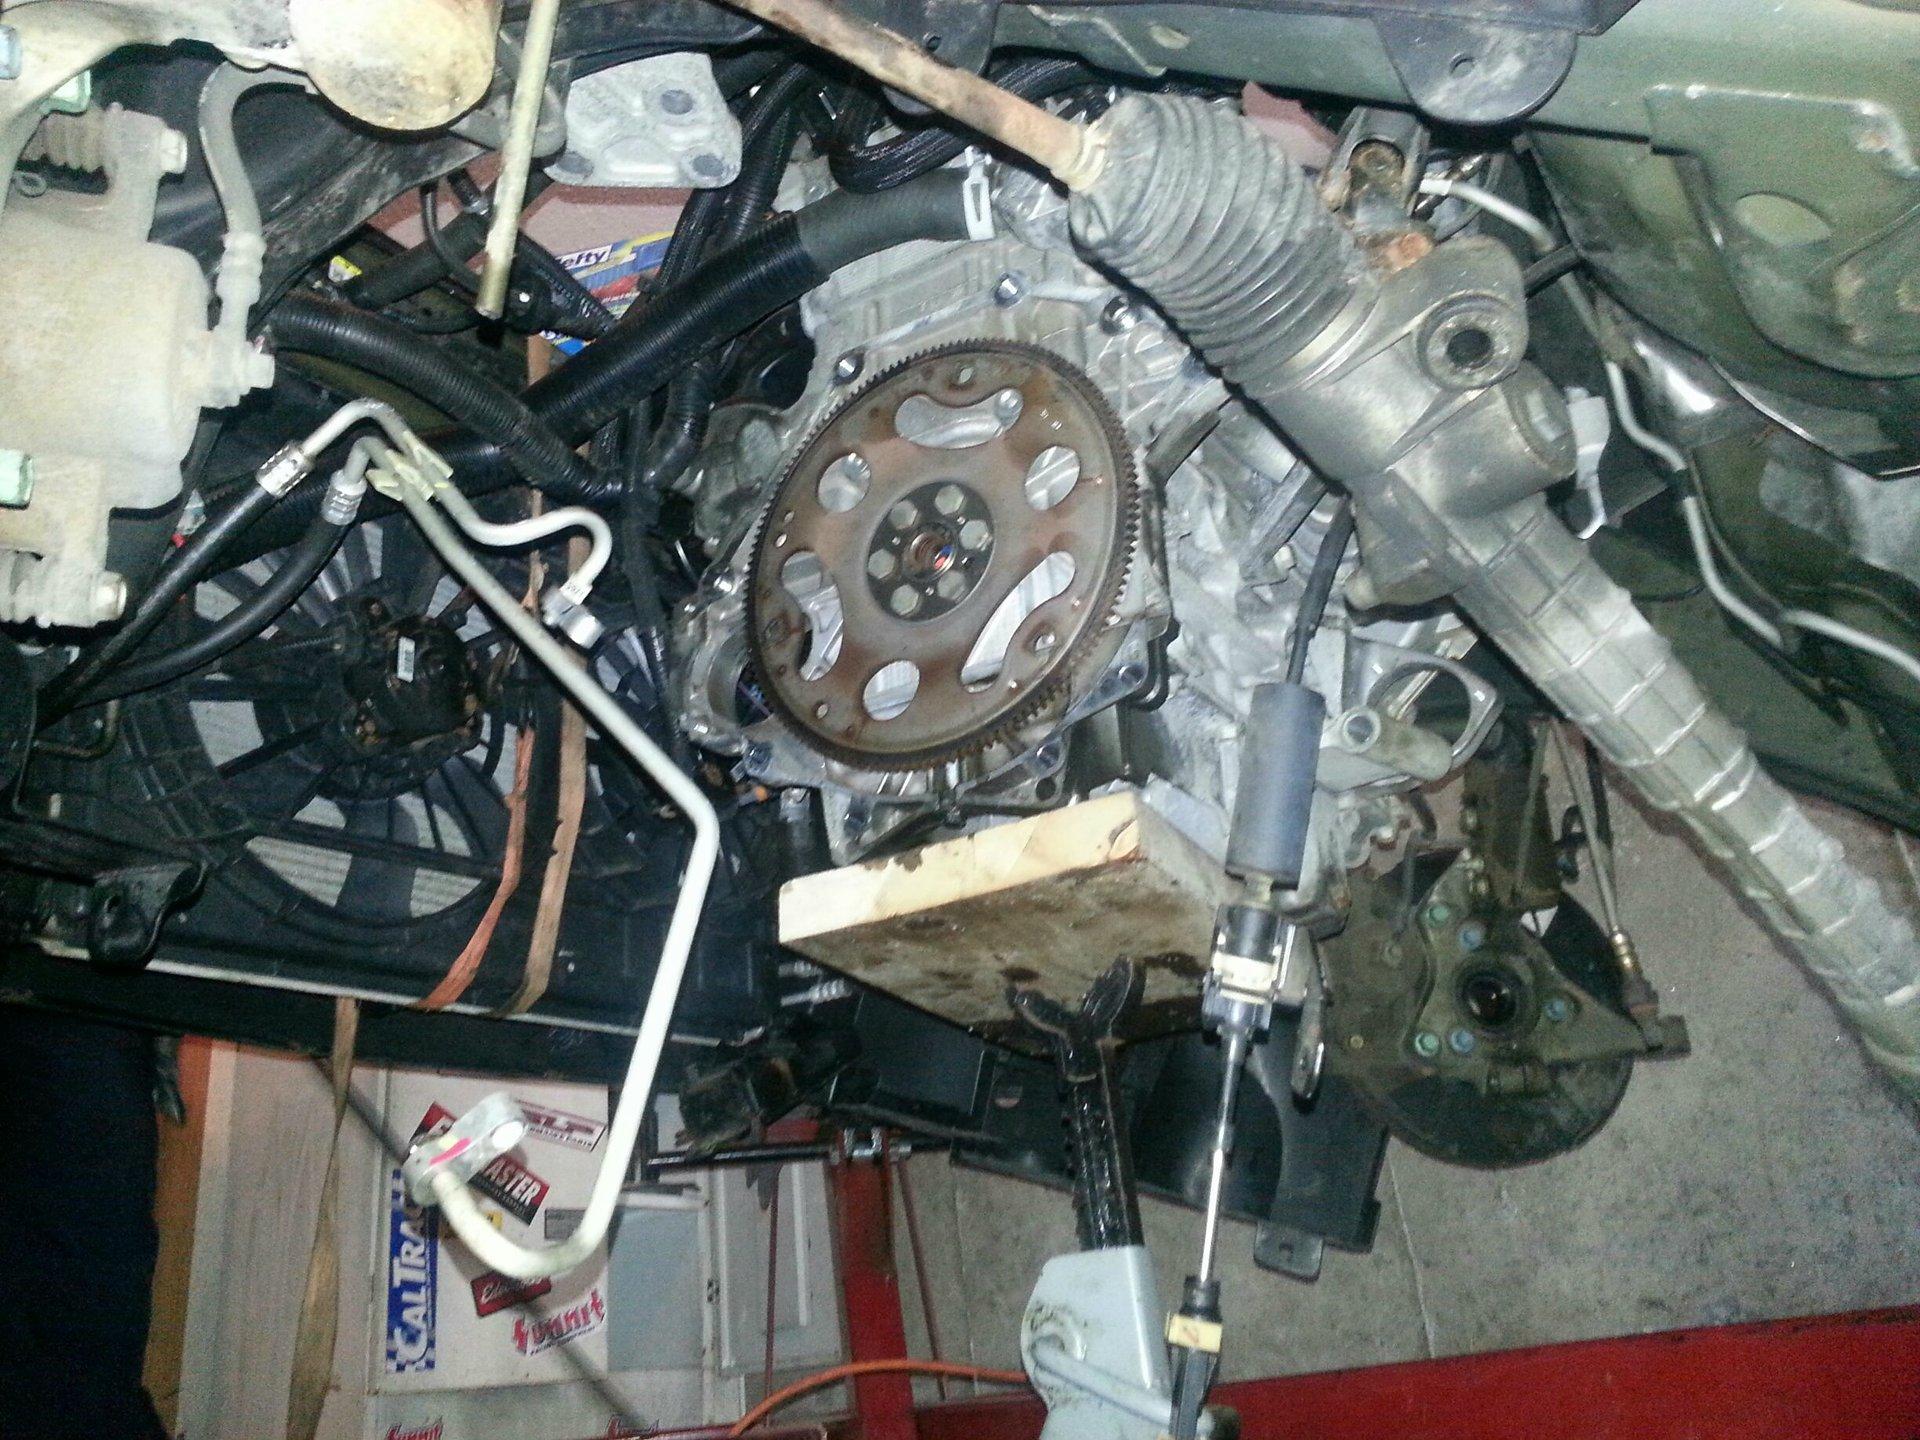 Transmission problem - MH8 6 speed dead at 128k miles?? | Chevrolet